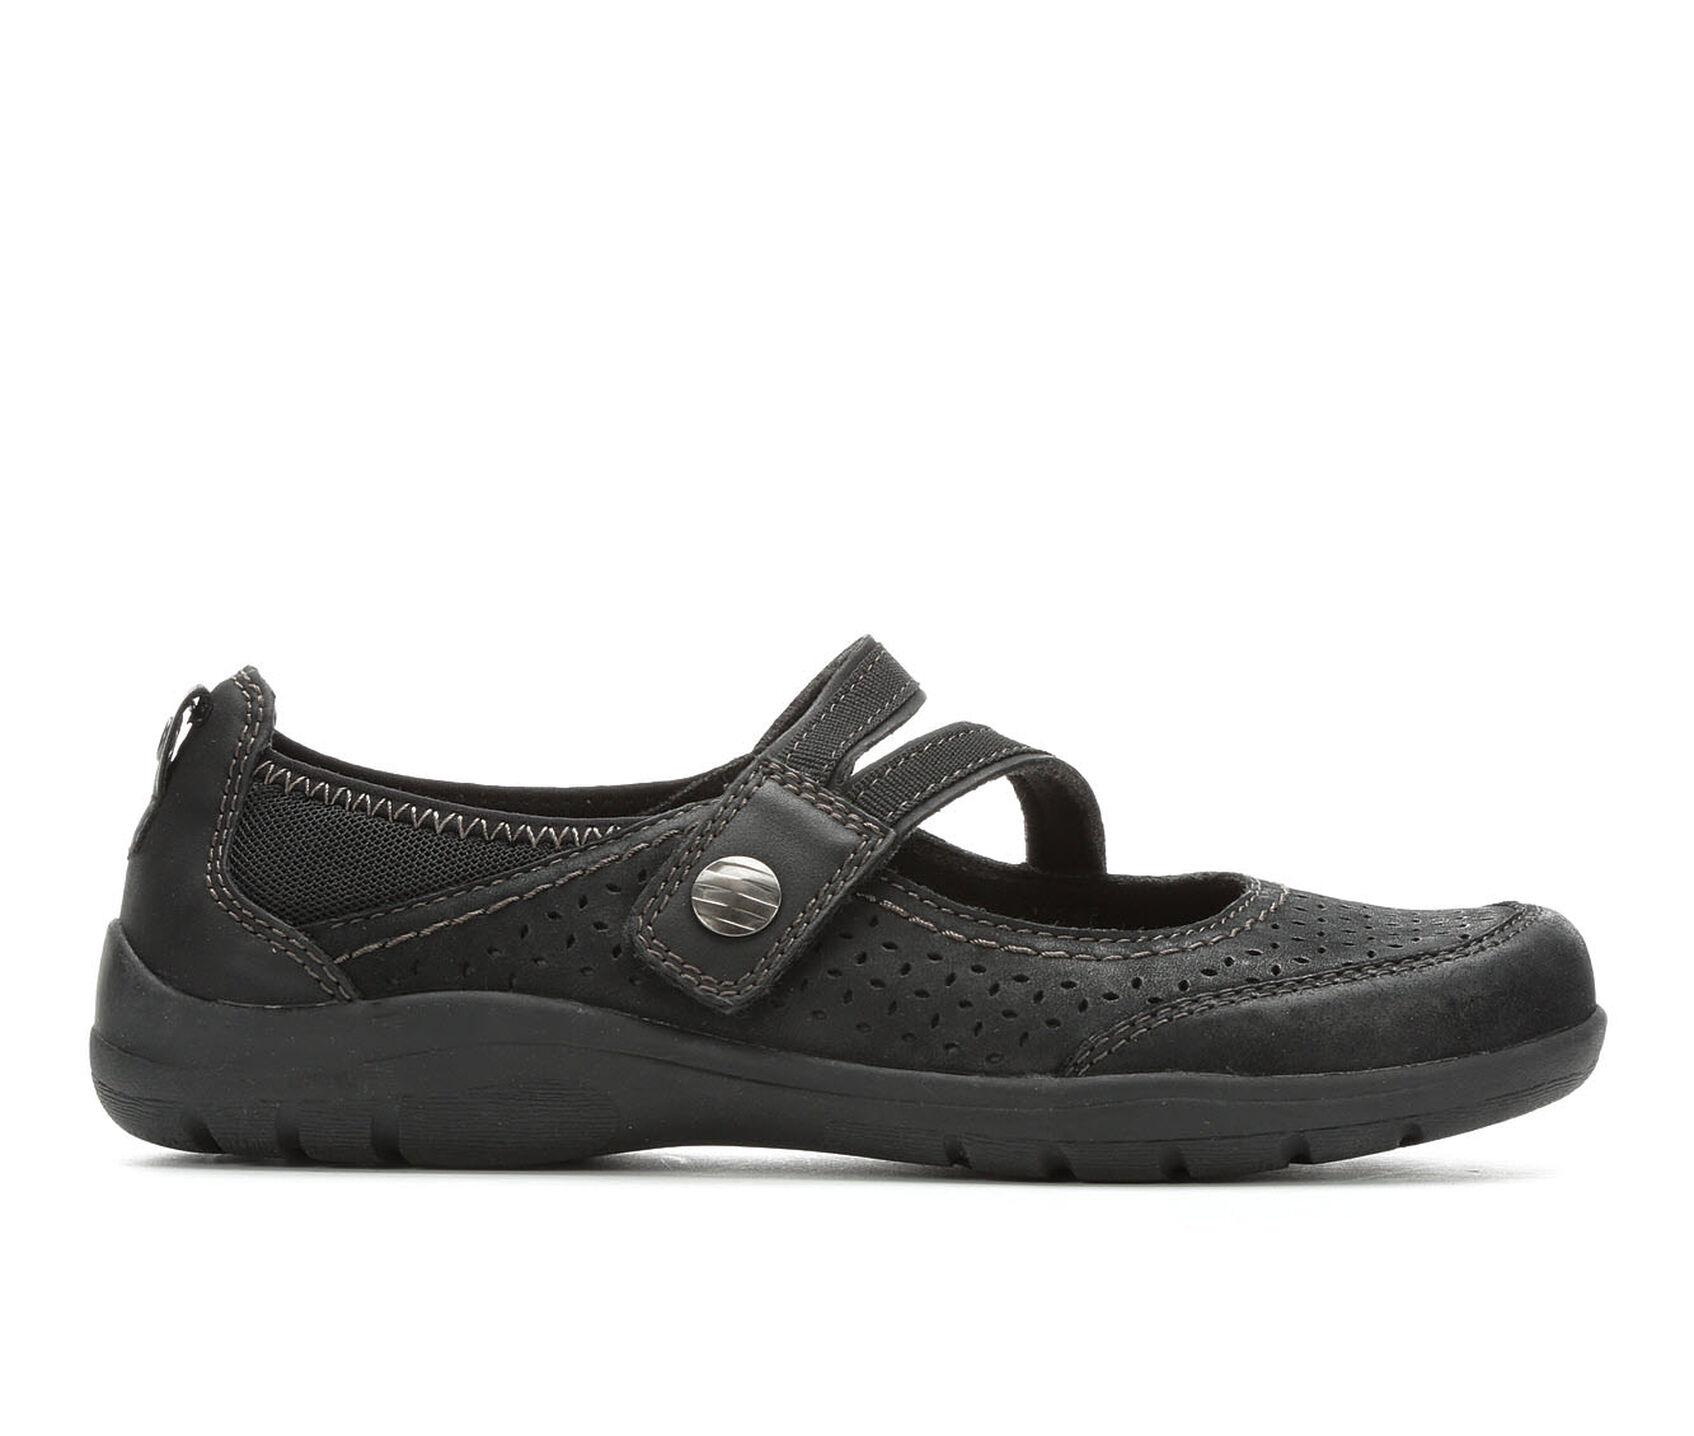 432f9f7cb2da Women s Earth Origins Tiffany Shoes